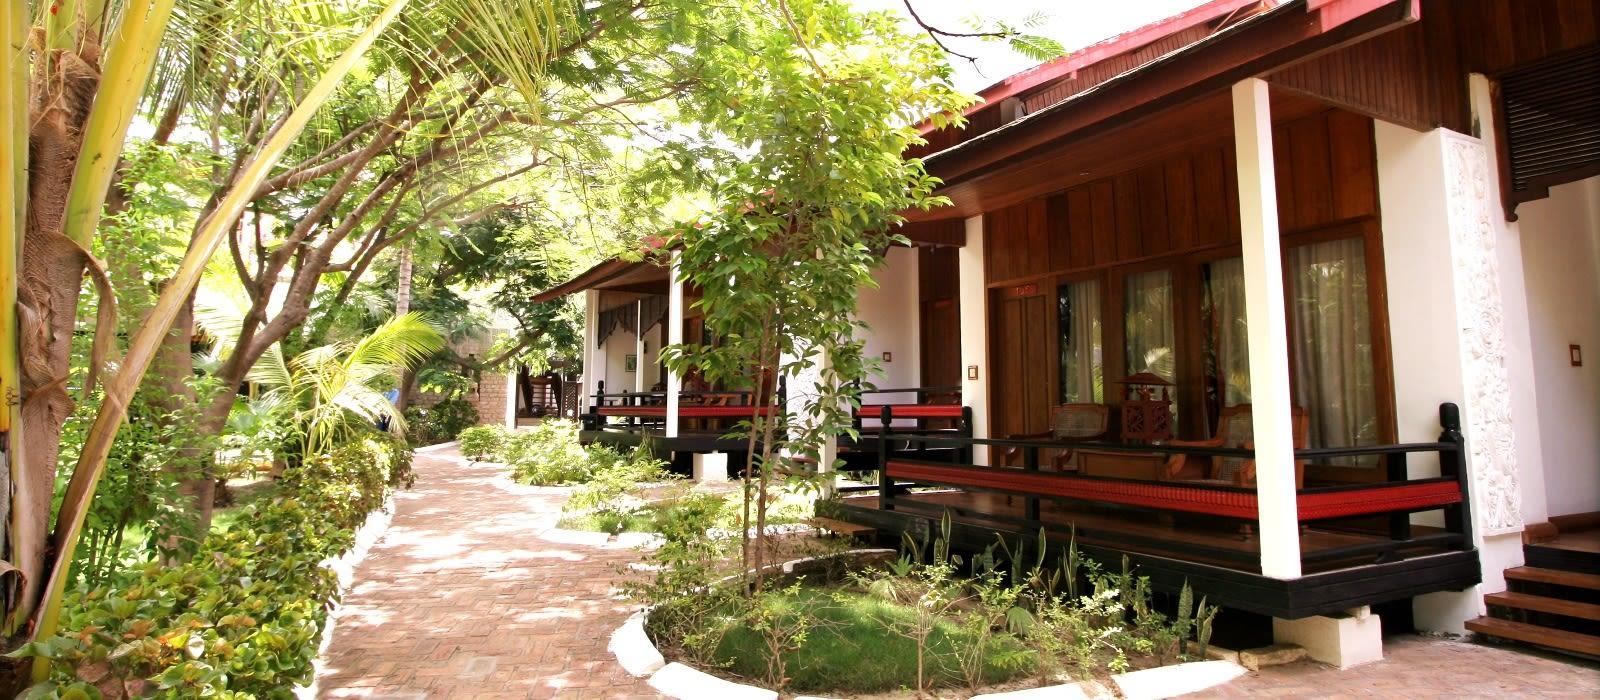 Hotel Thazin Garden Myanmar